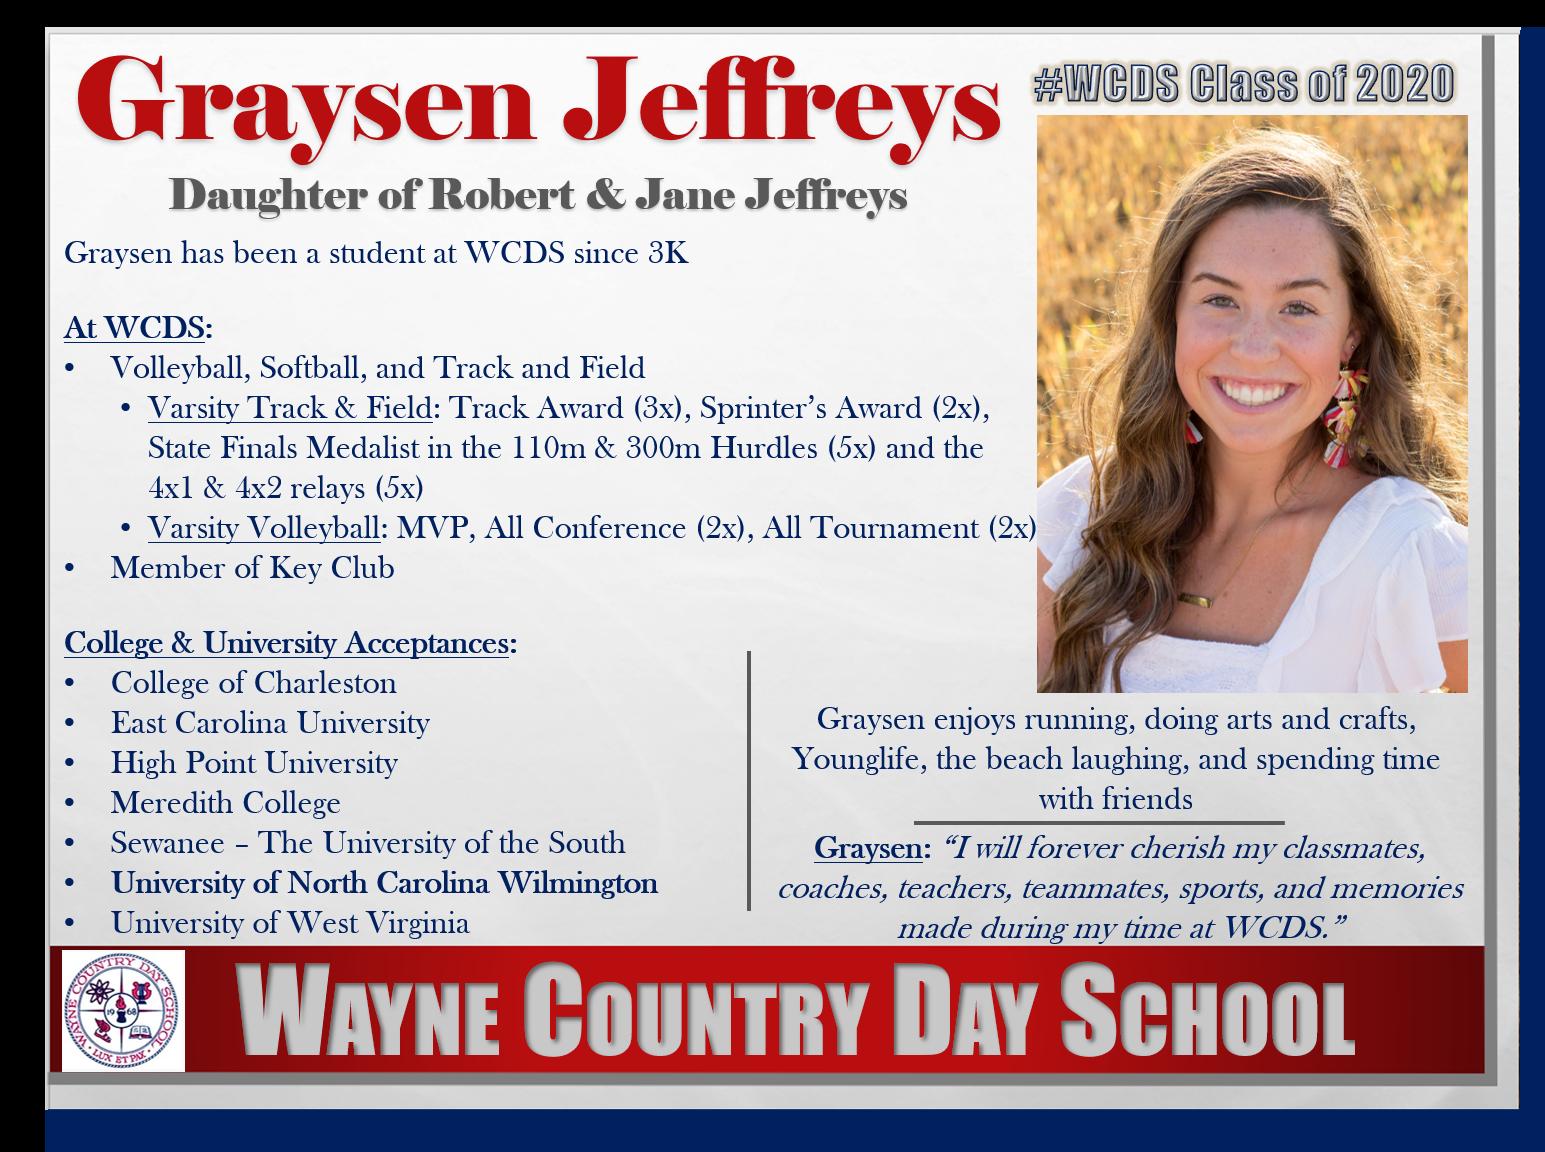 Graysen Jeffreys